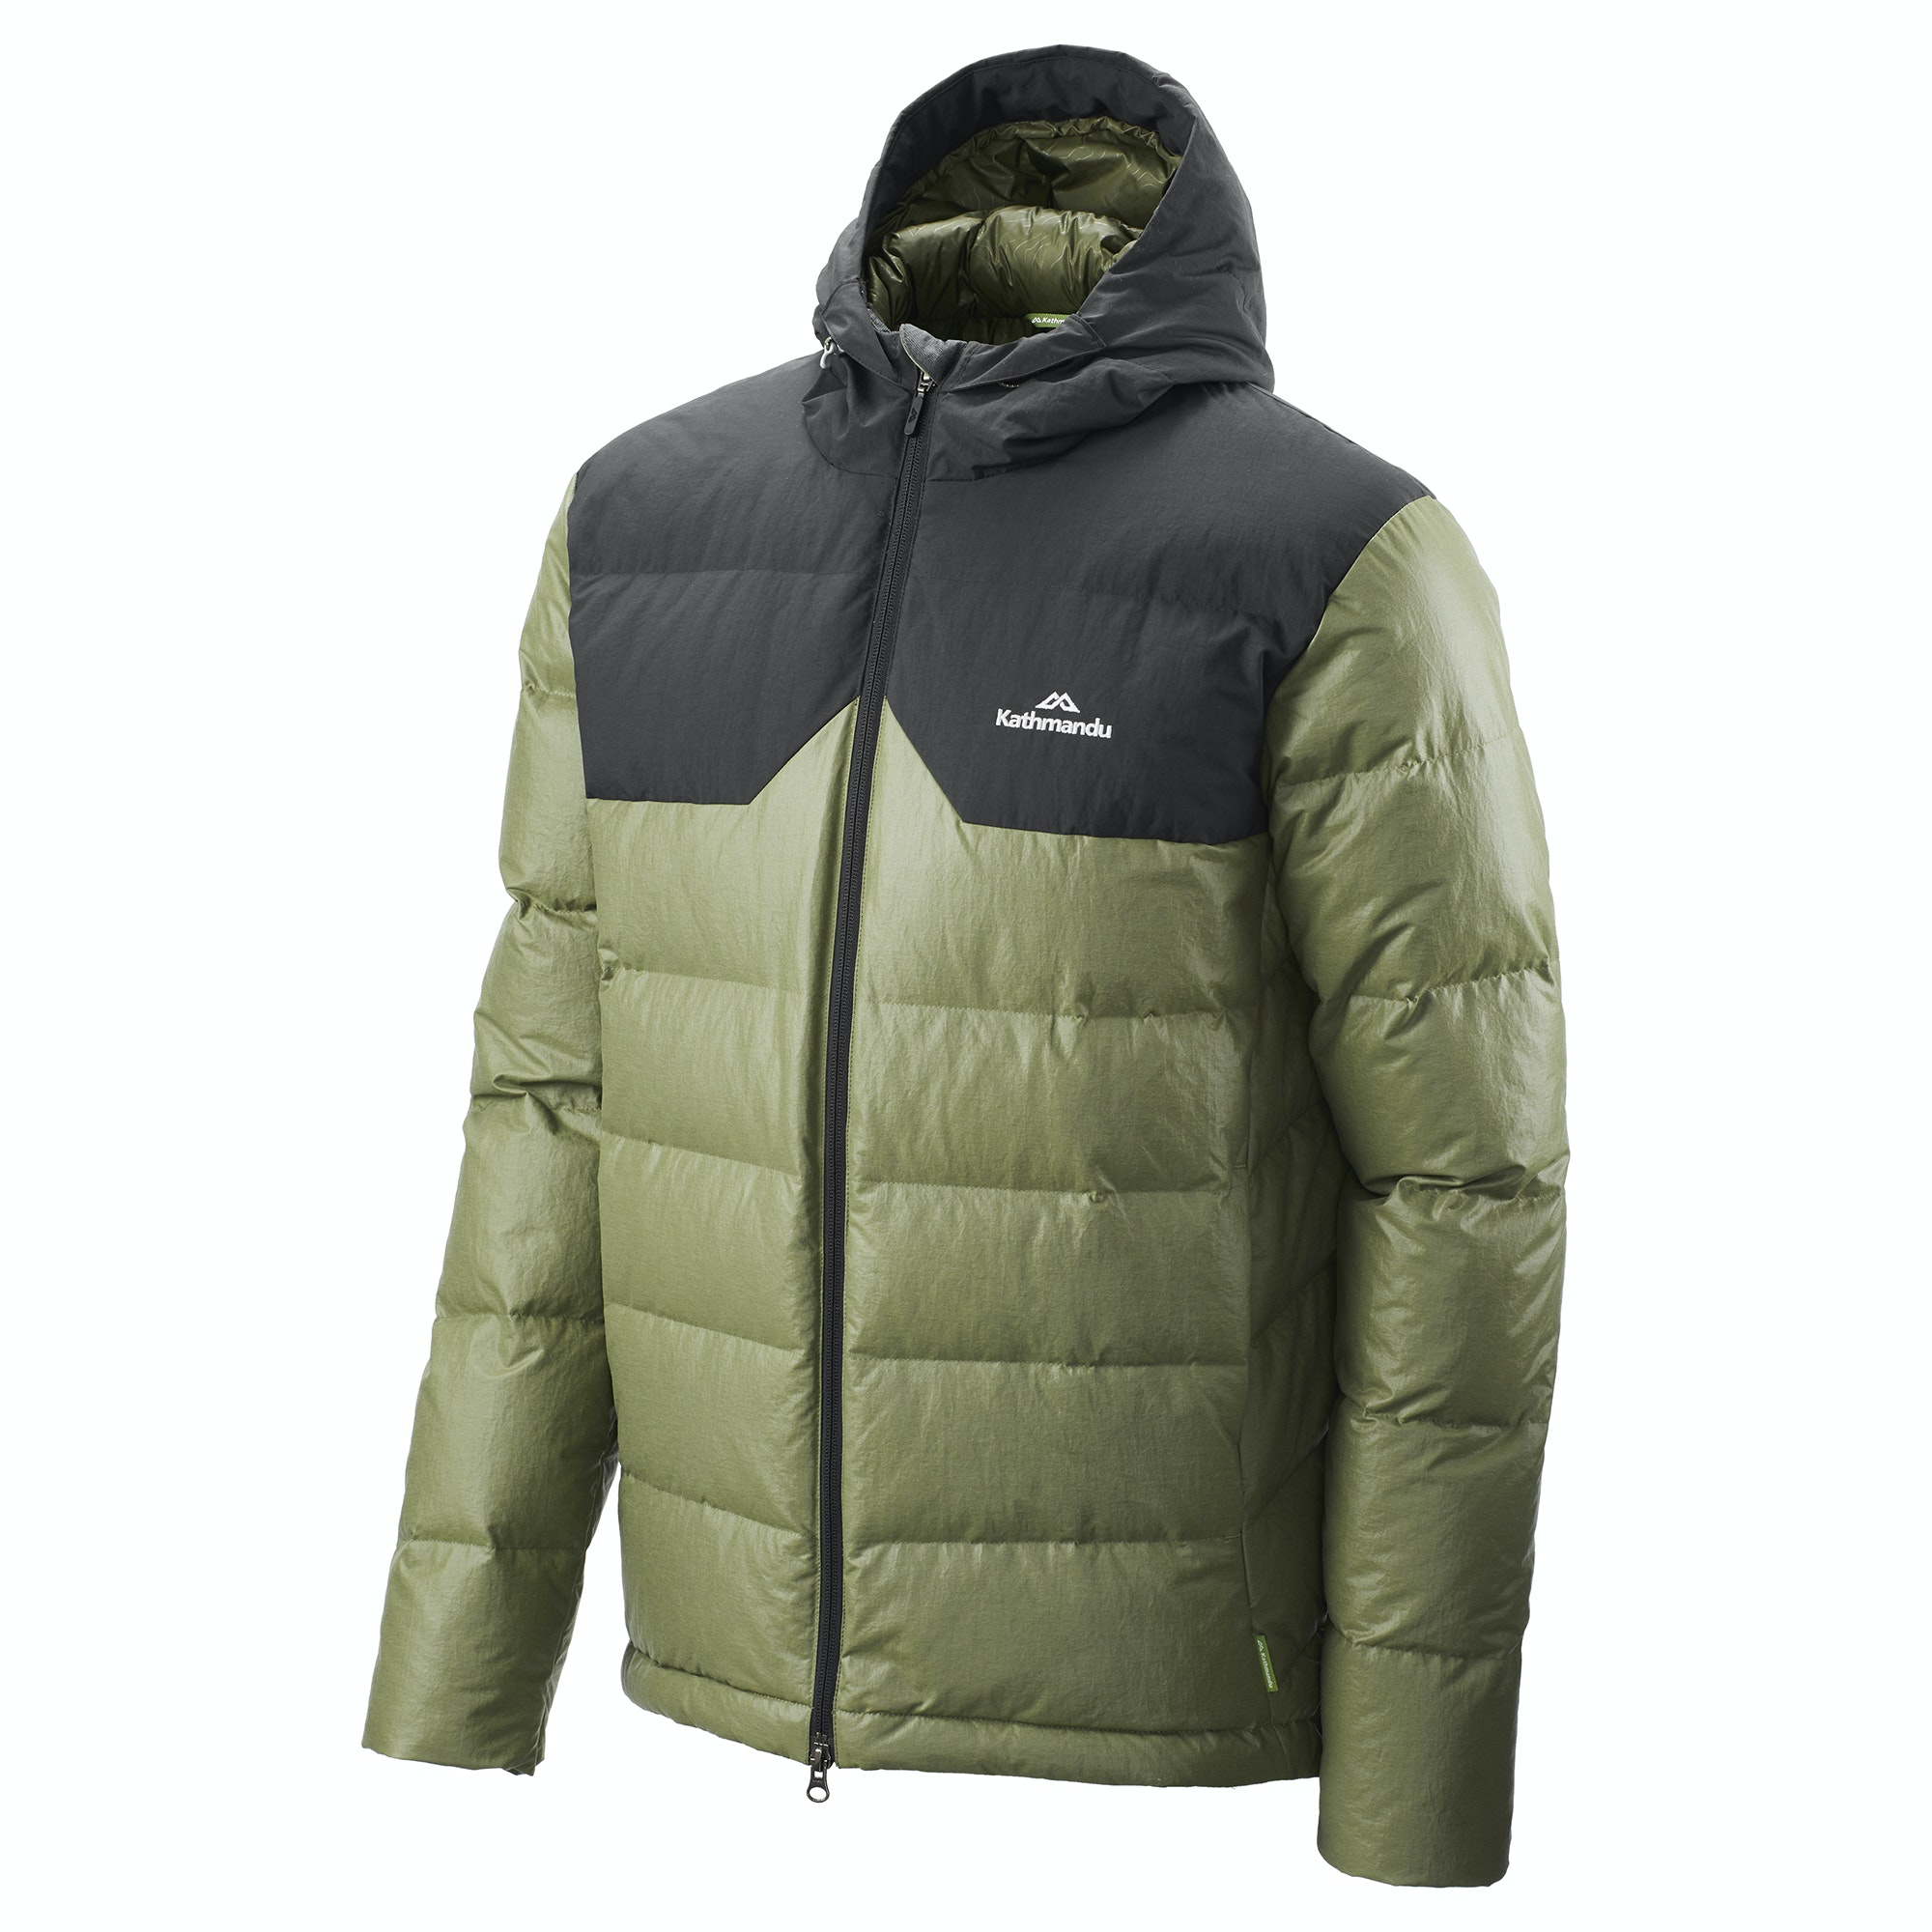 NEW-Kathmandu-Epiq-Men-039-s-Hooded-Warm-Winter-Duck-Down-Puffer-Jacket-v2 thumbnail 23